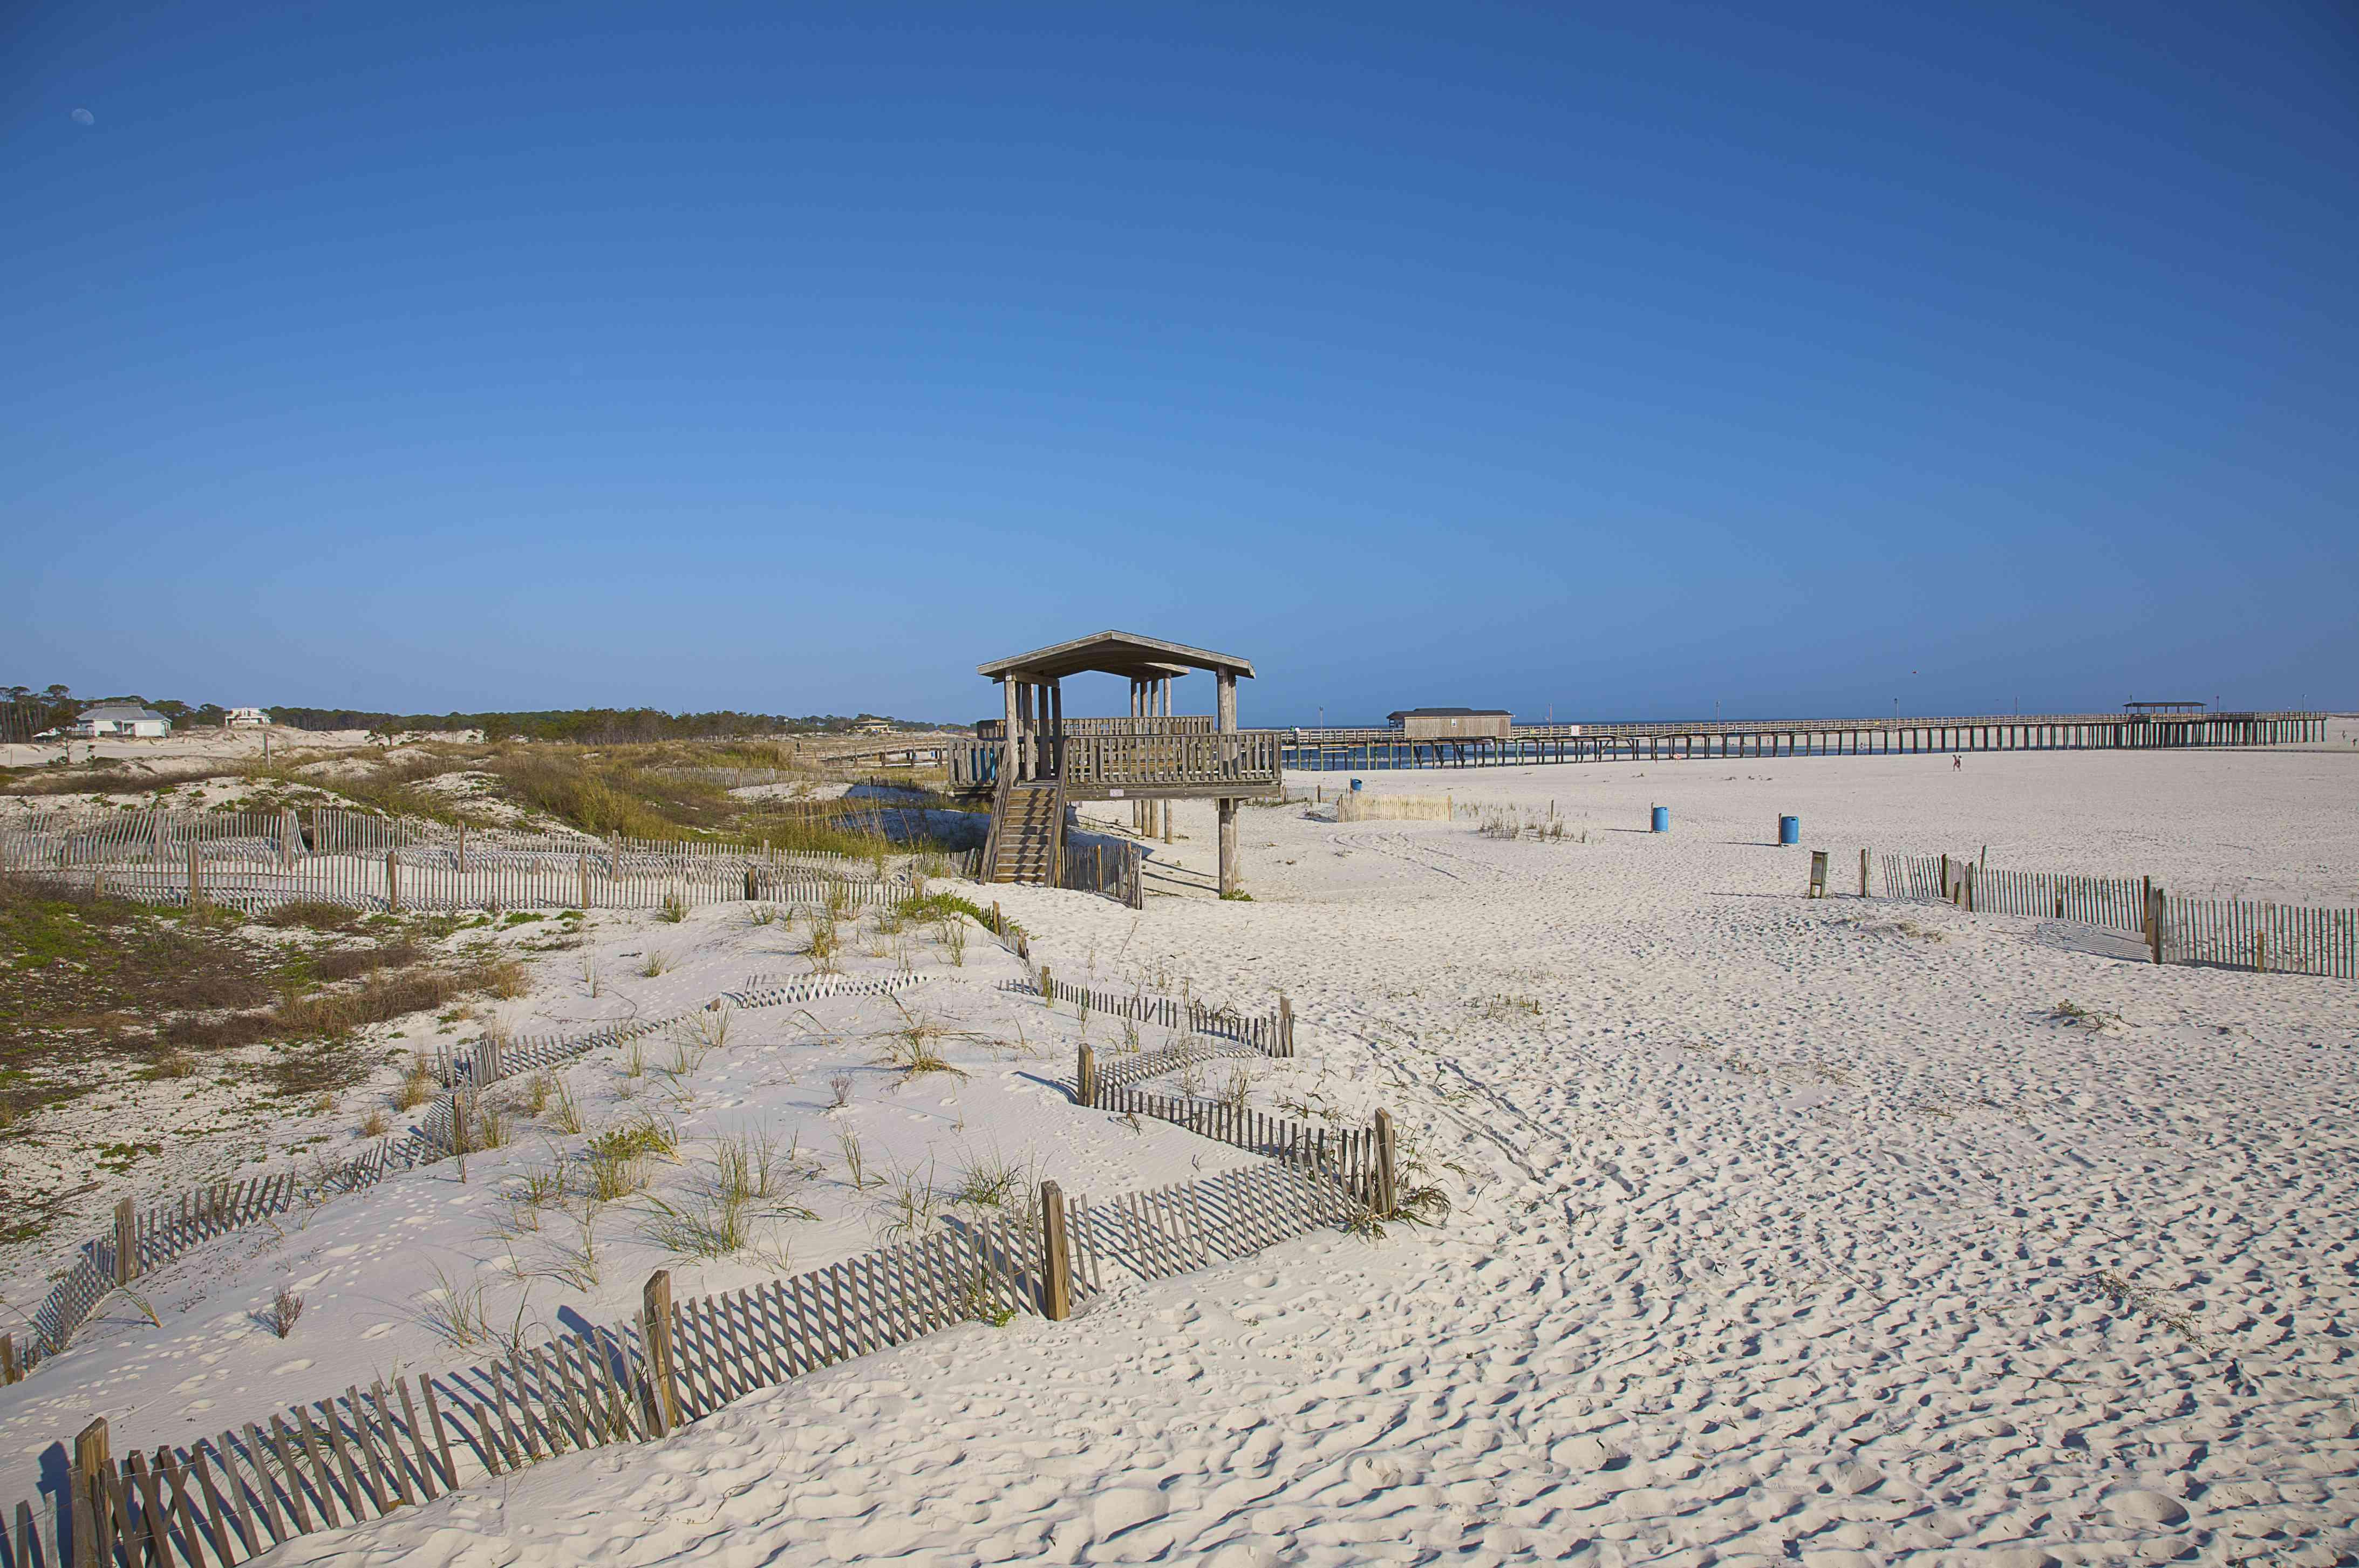 White sand beach, Dauphin Island (near Mobile), Alabama